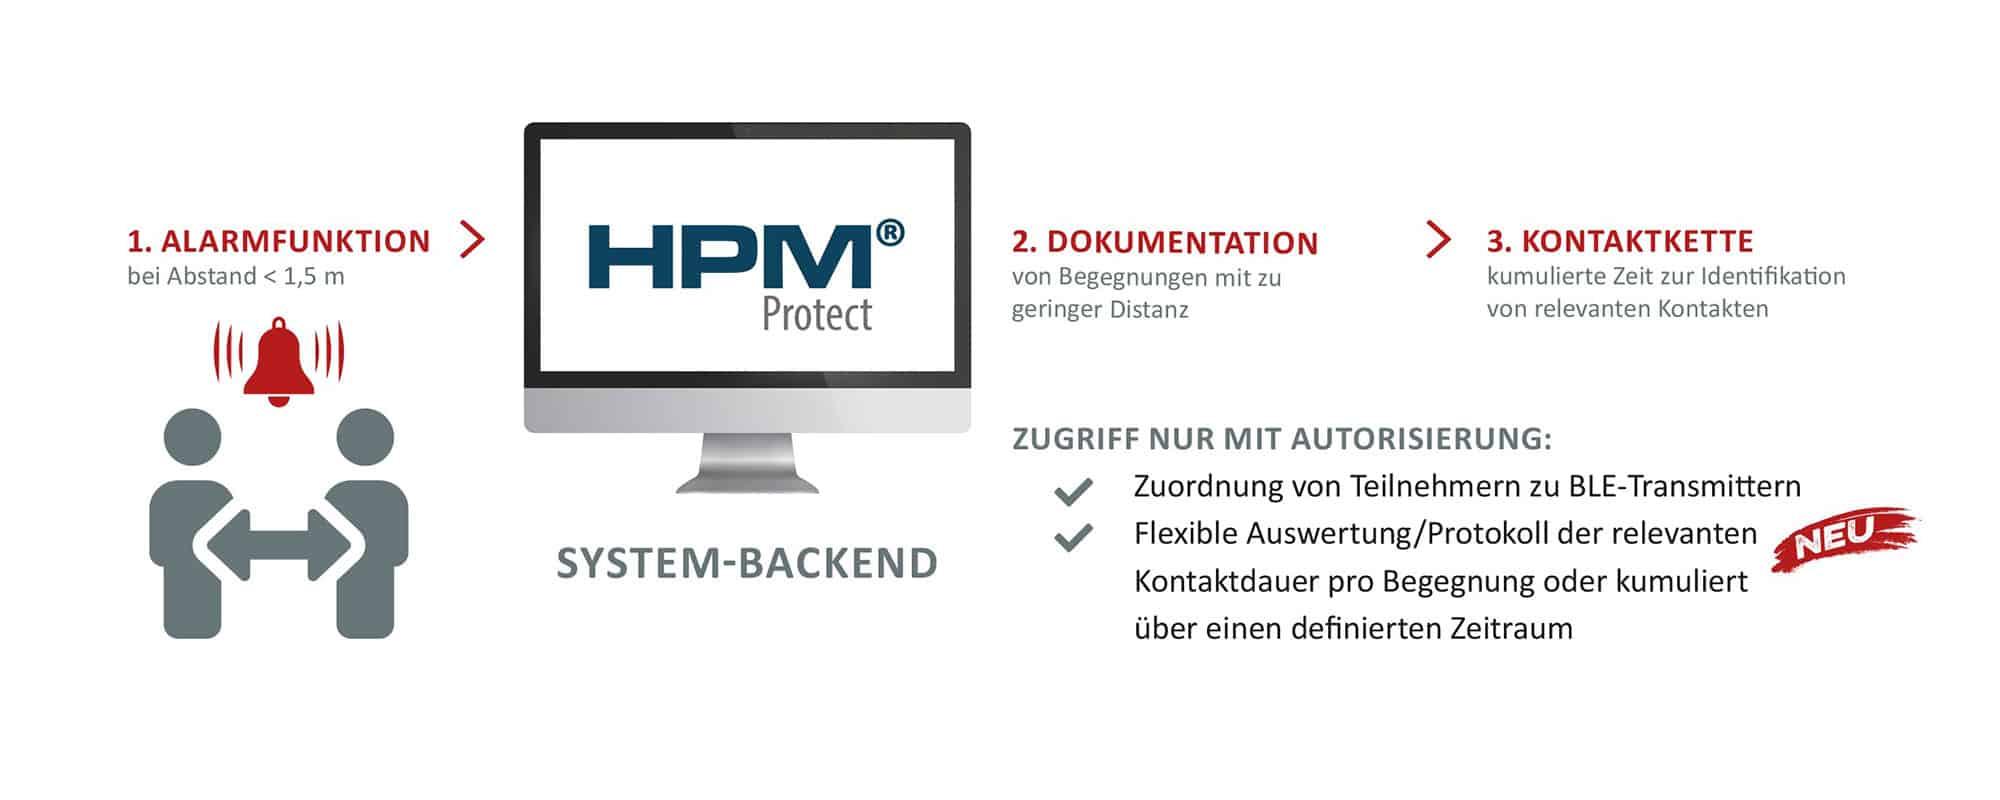 HPM Protect als Social Distancing Warnsystem im Krankenhaus: So funktoniert es